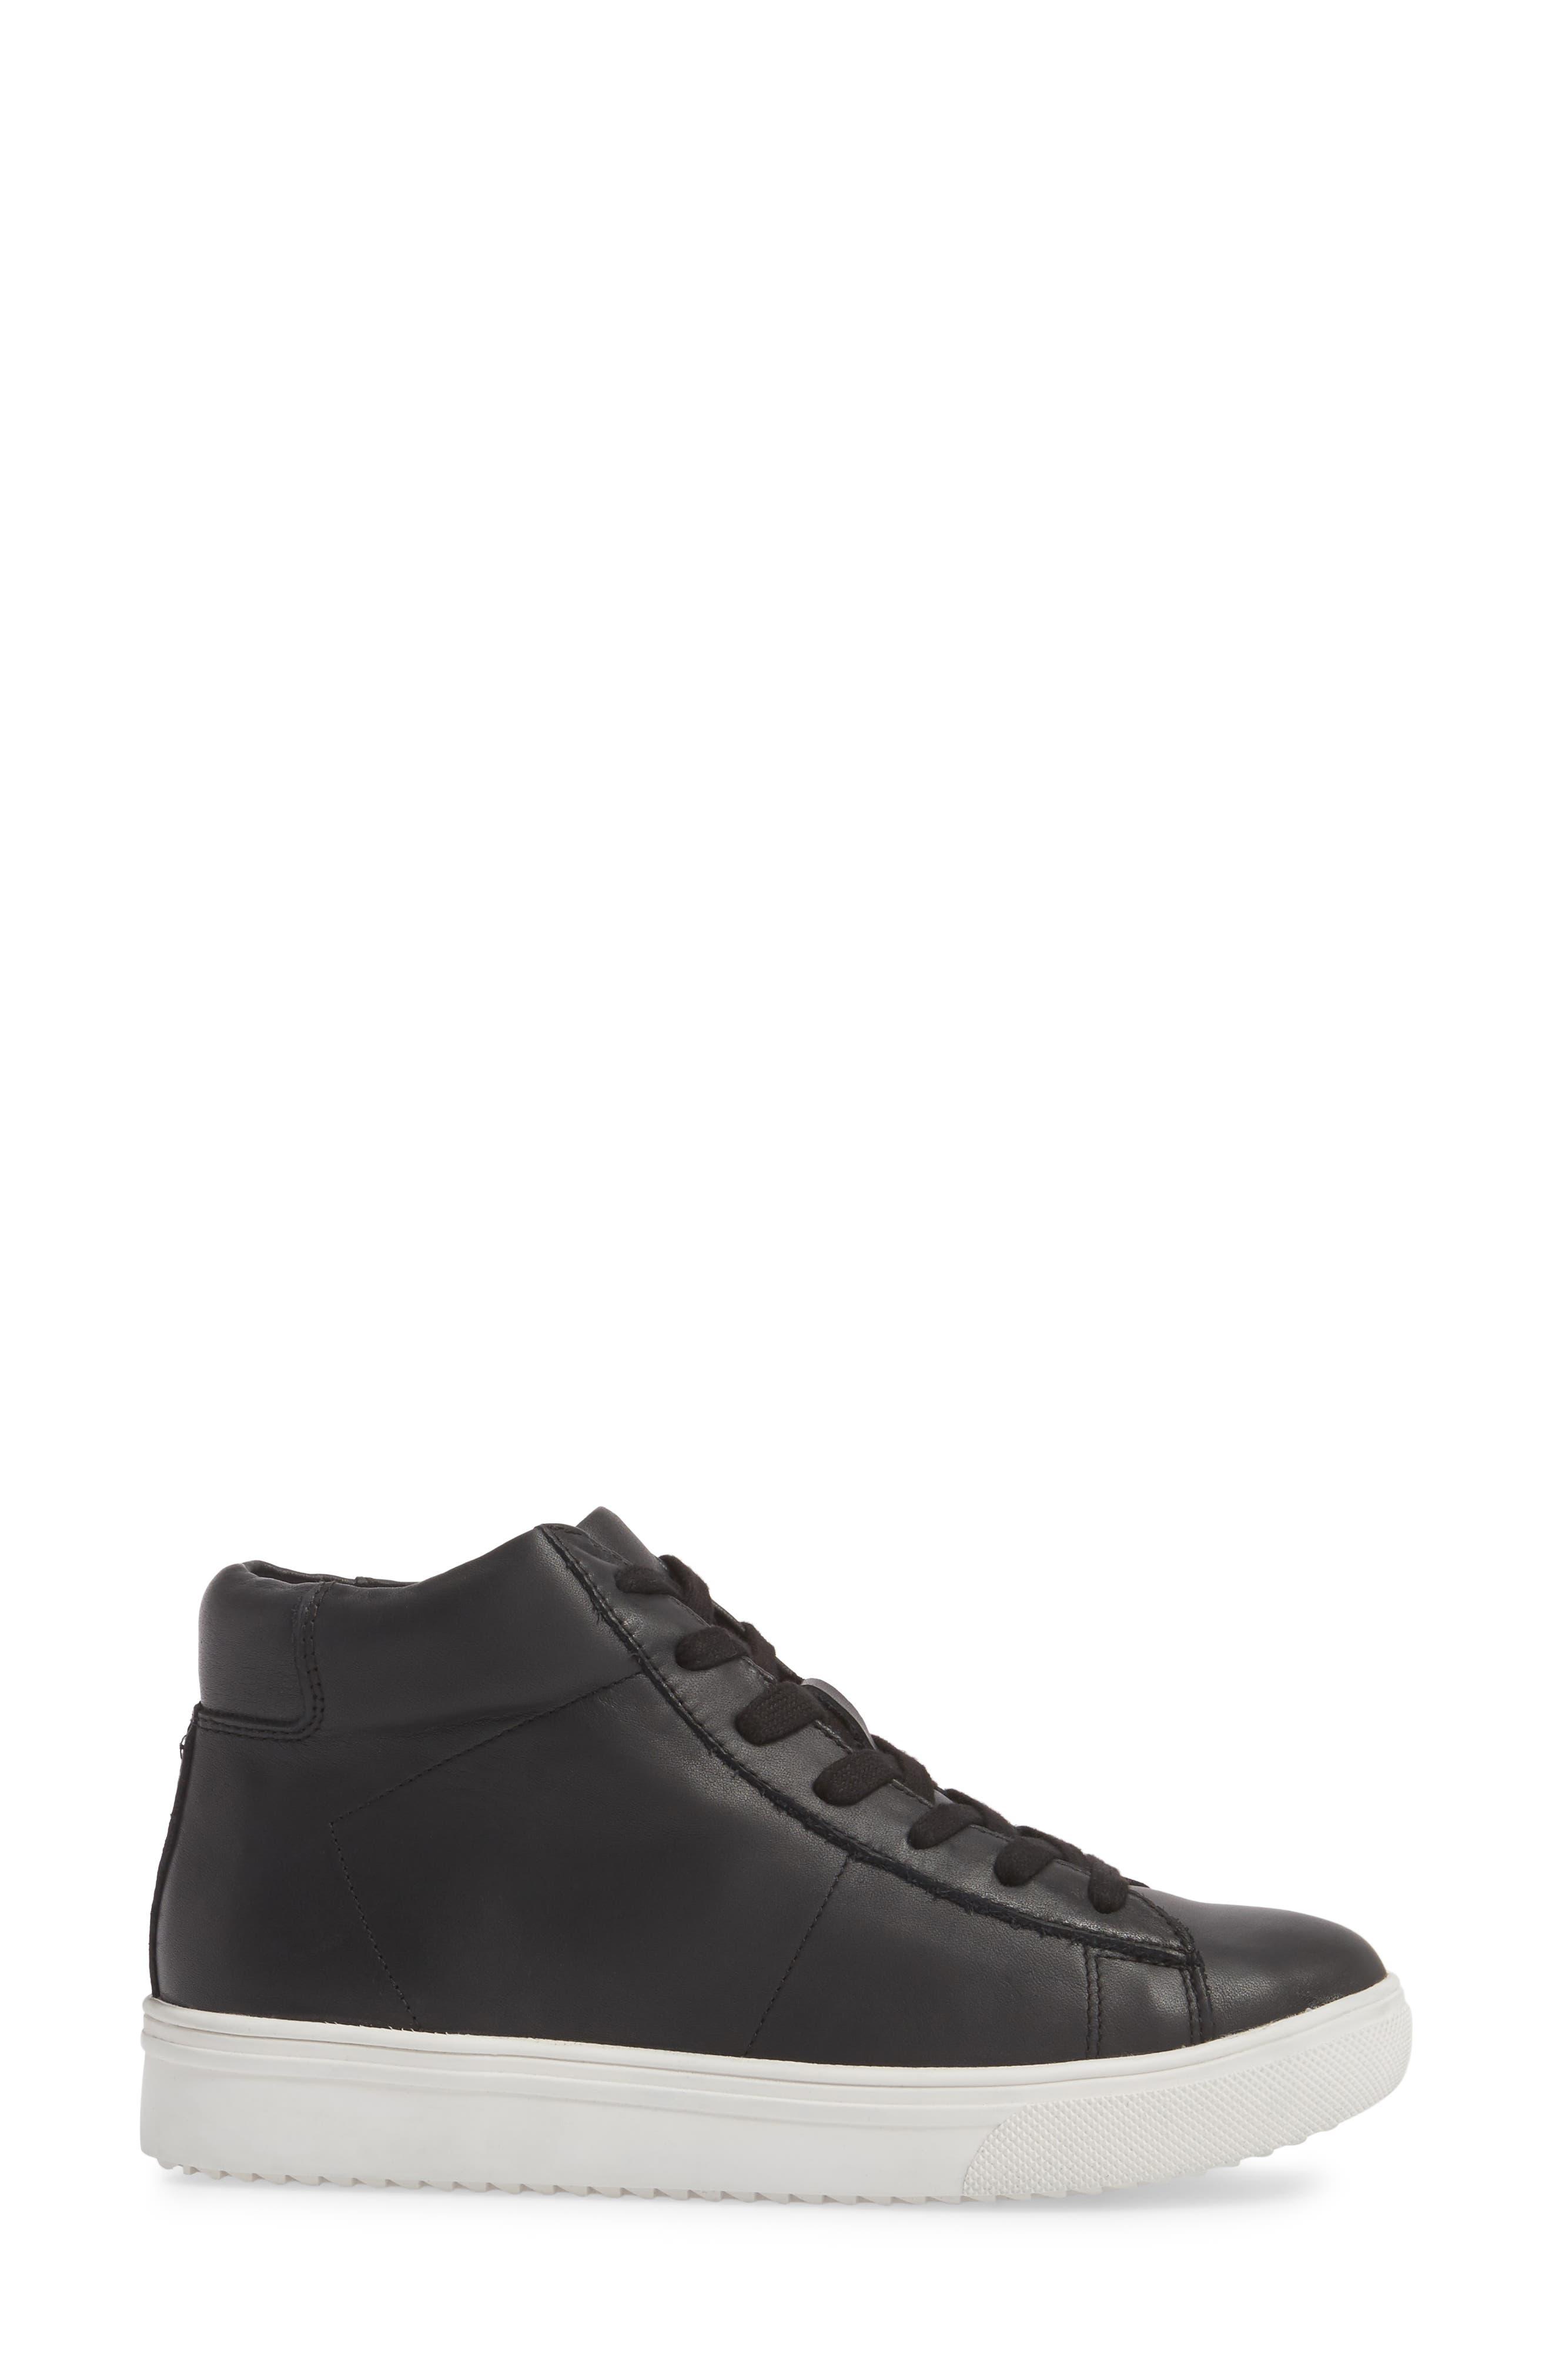 Jax Waterproof High Top Sneaker,                             Alternate thumbnail 9, color,